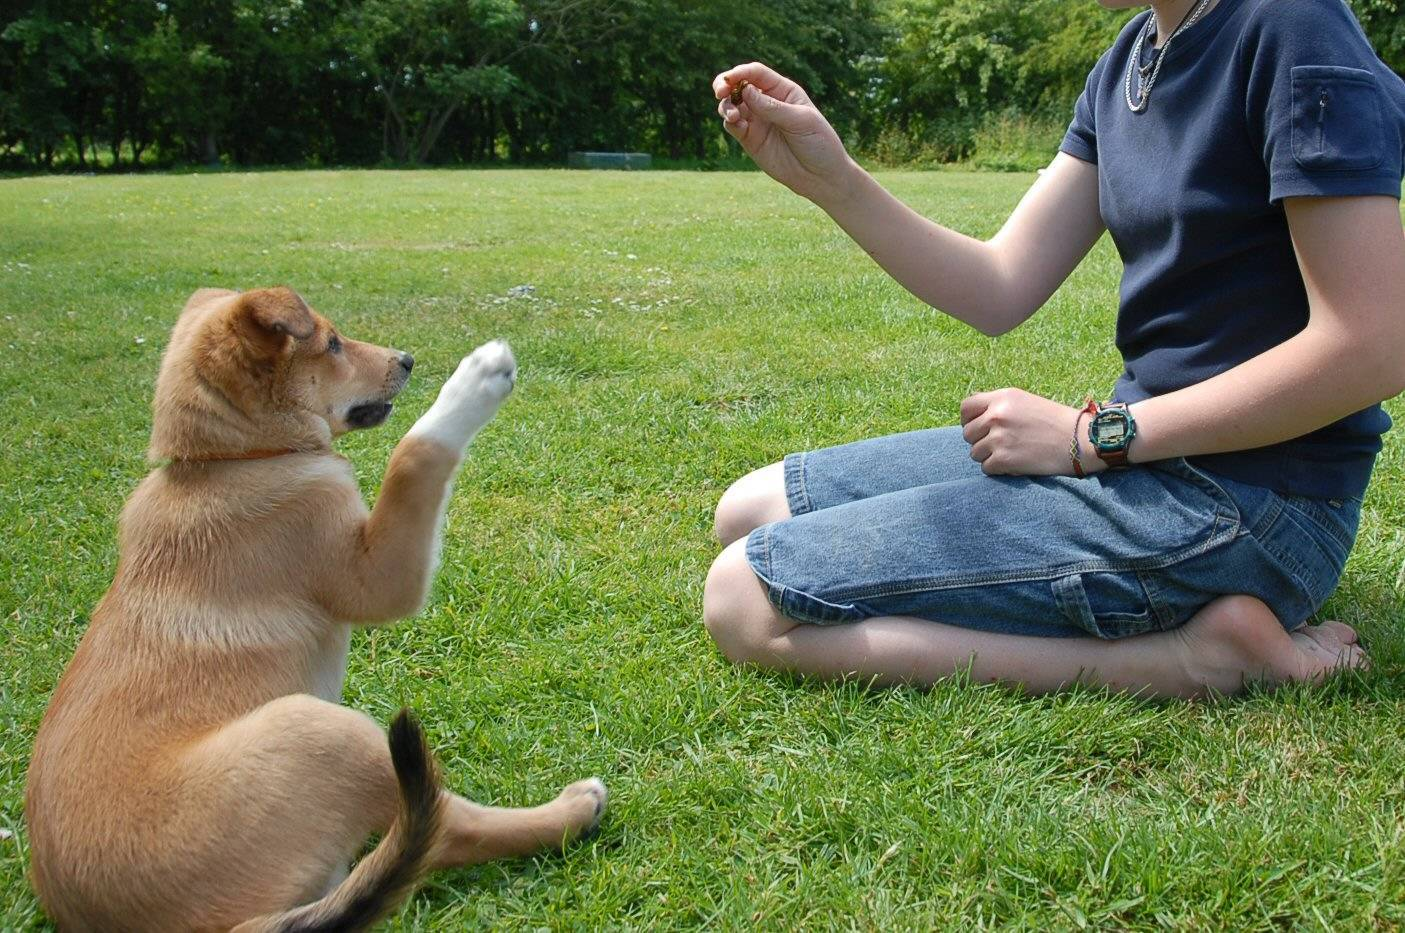 e8233f584b5b880ef946_Dog-Training-How-to-Train-Your-Dog-to-Sit1440856.jpg